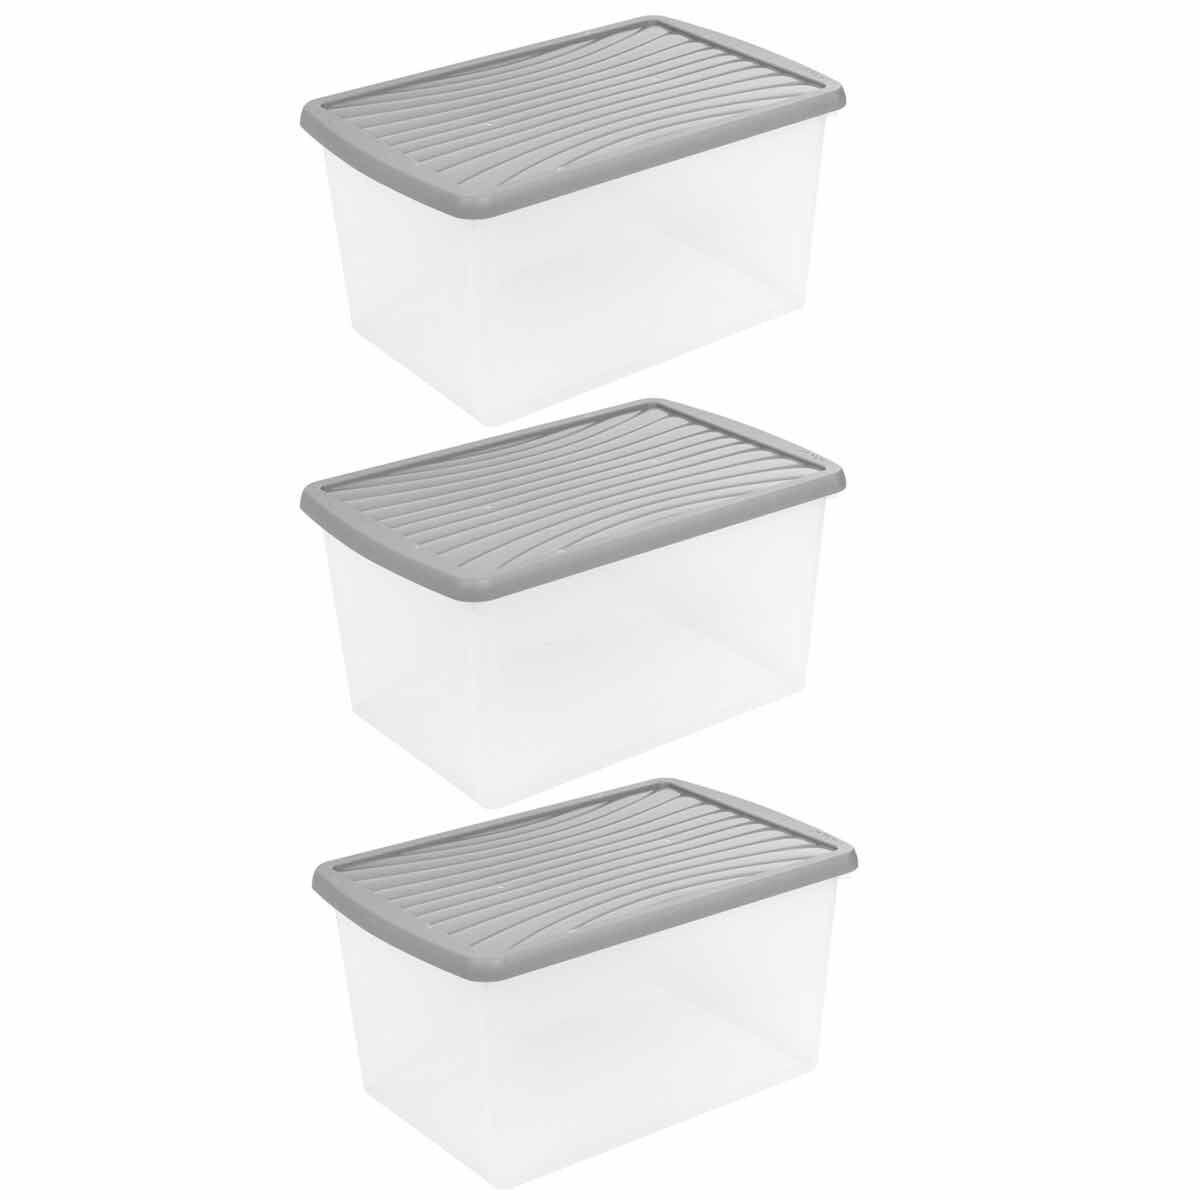 Wham Plastic Storage Box 37 Litres Pack of 3 Grey